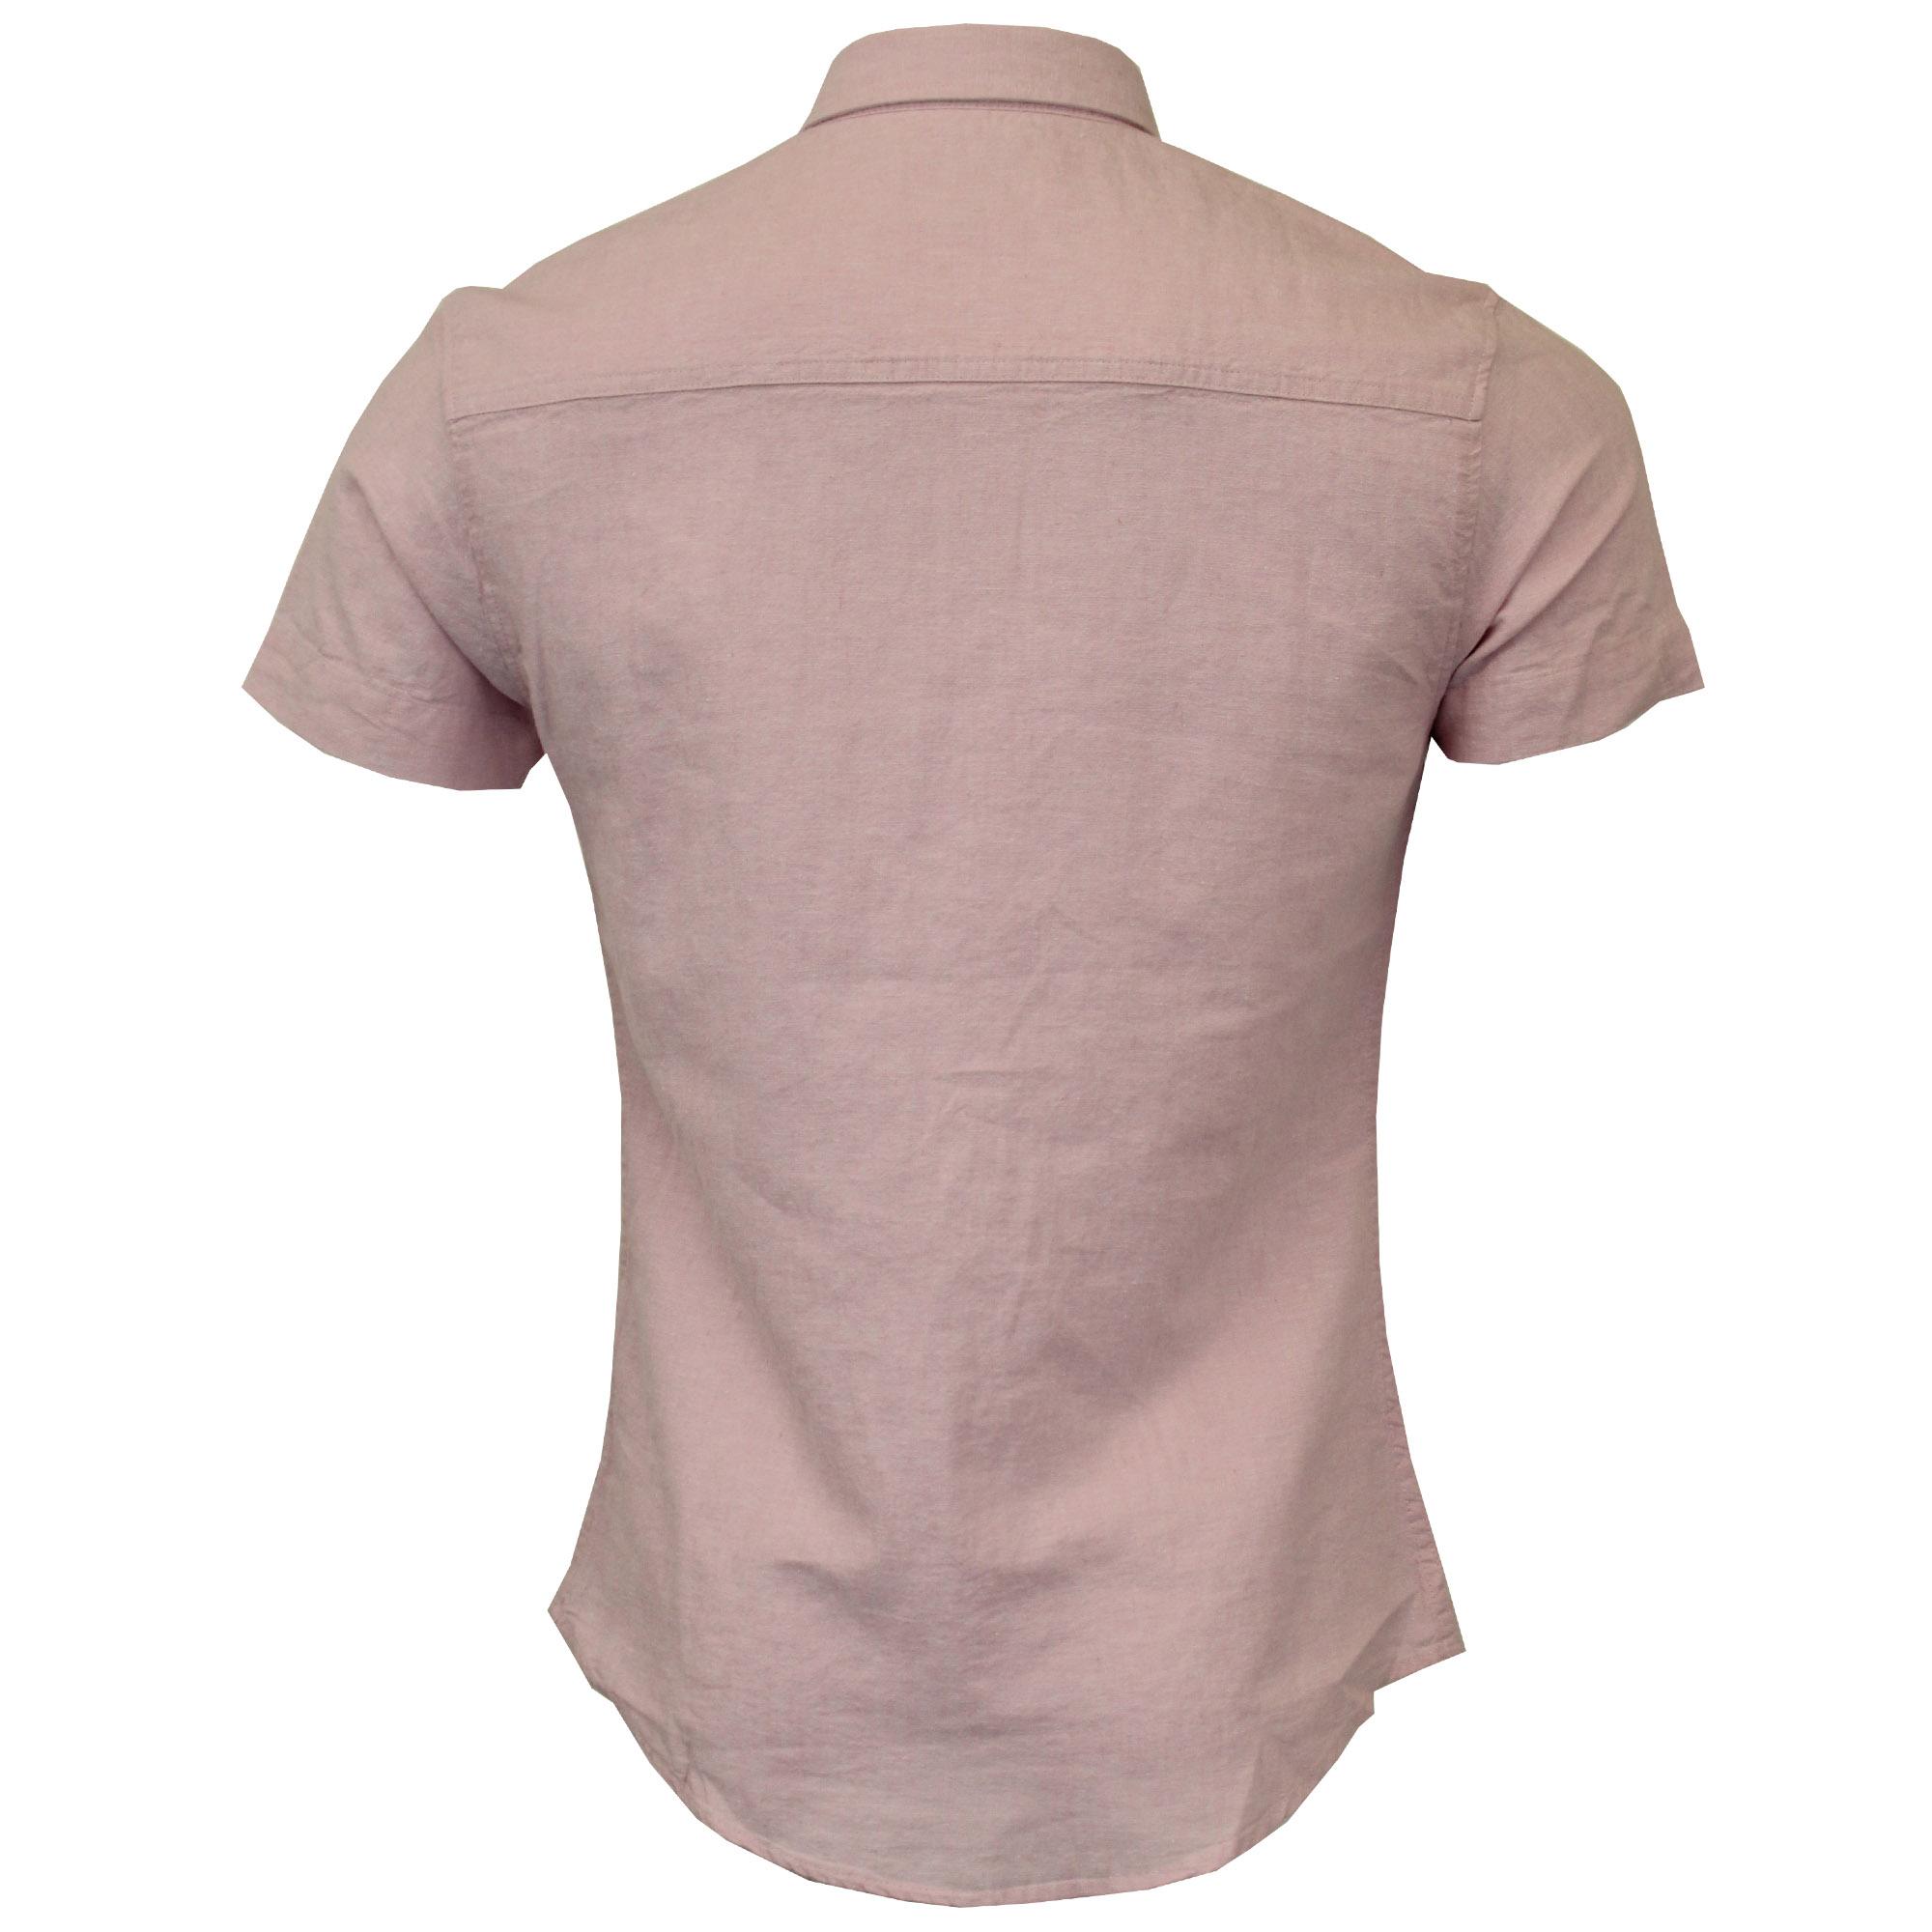 Mens-Linen-Shirt-Threadbare-Short-Sleeved-Brave-Soul-Collared-Casual-Summer-New thumbnail 20